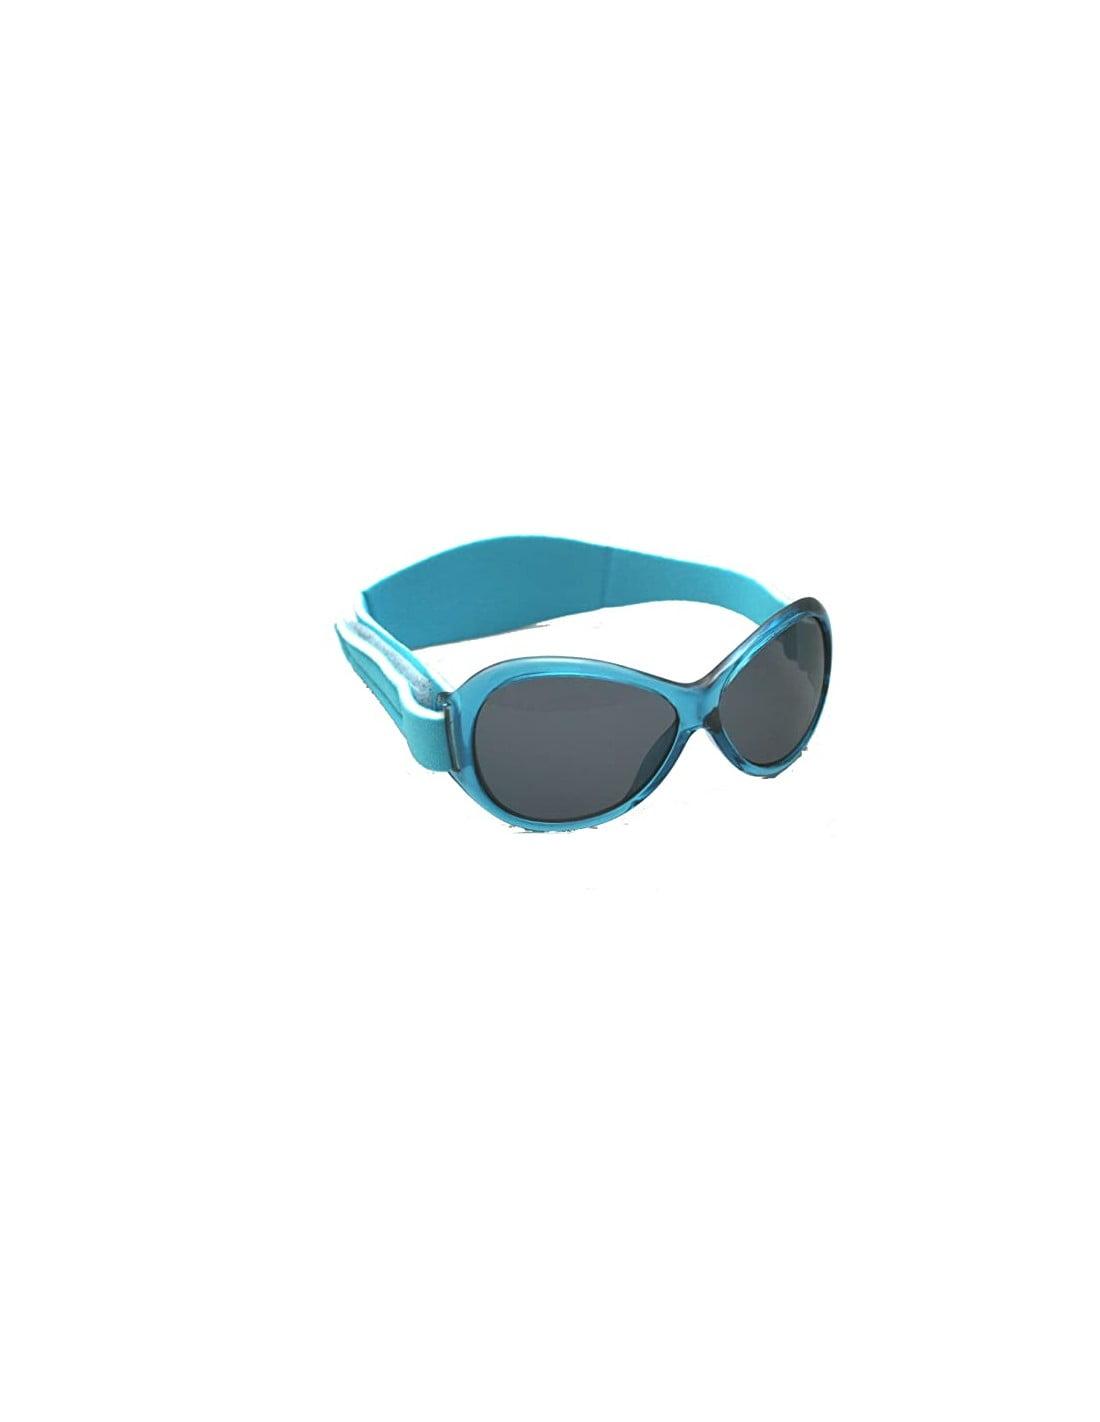 Ochelari de soare Bebe 2-5 ani Retro Oval Aqua Banz